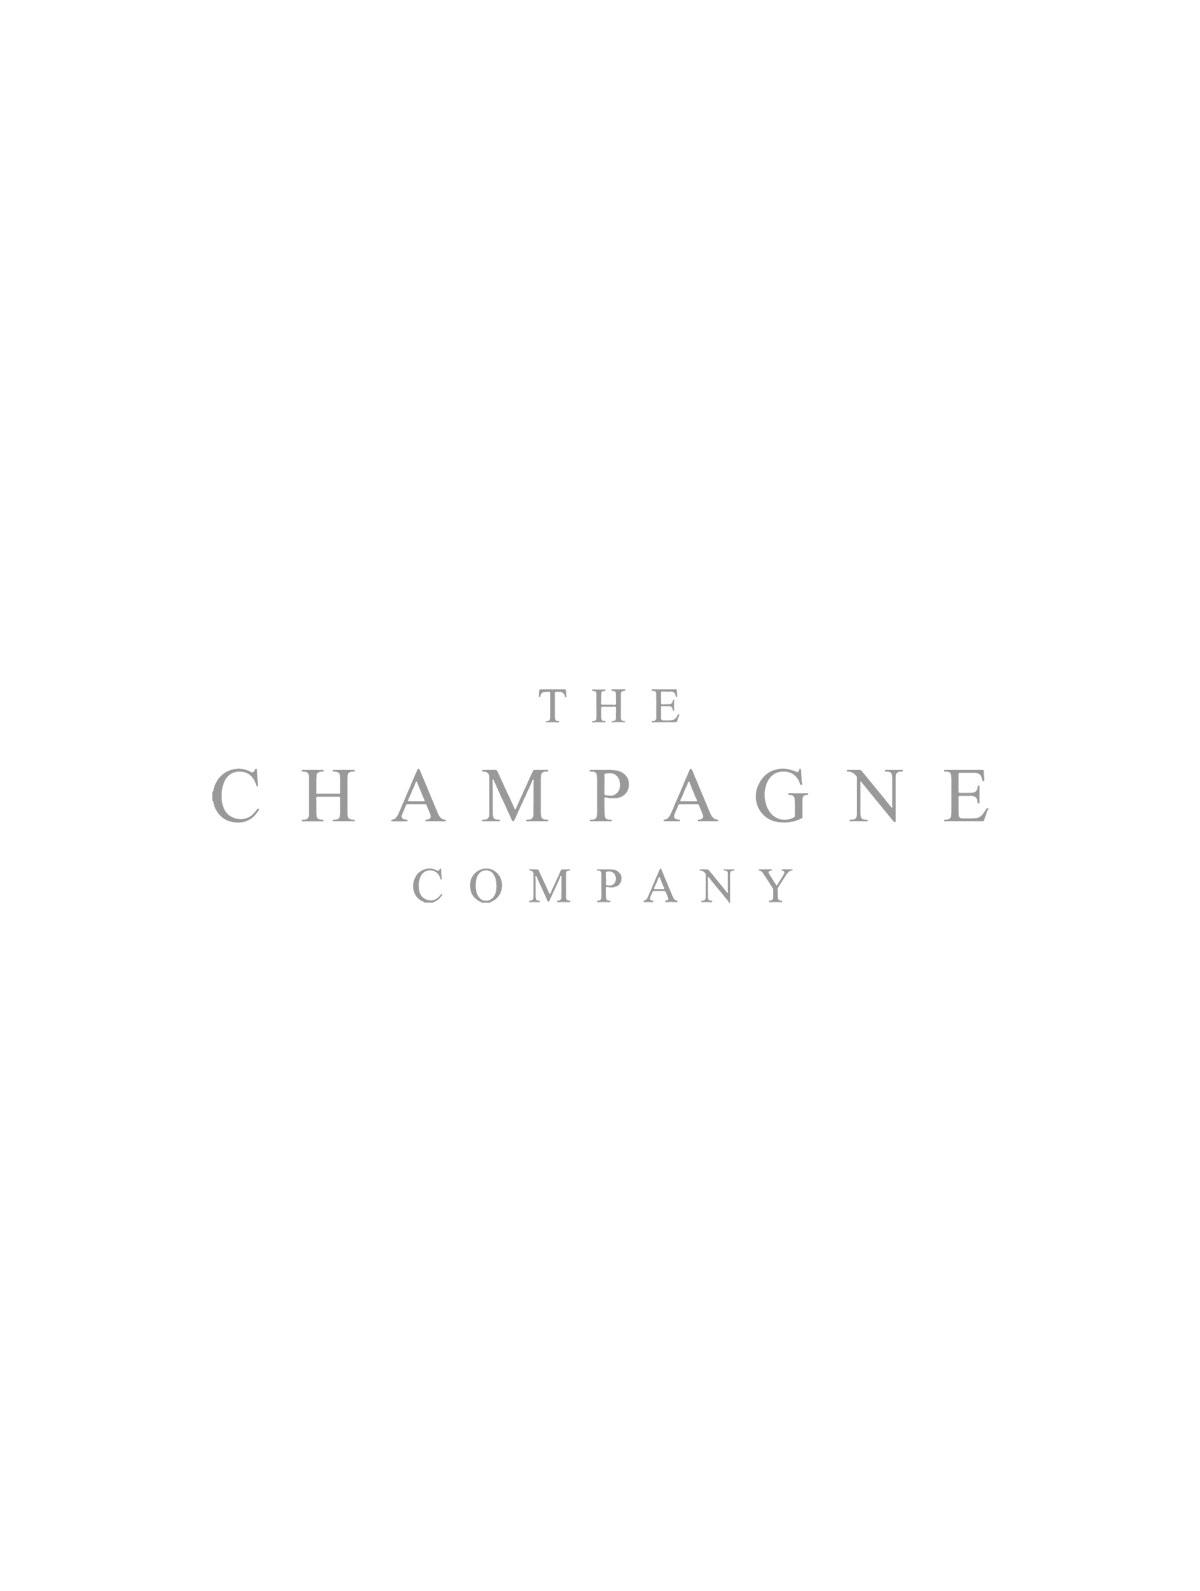 Dom Perignon 2008 Vintage Champagne Gift Boxed 75cl